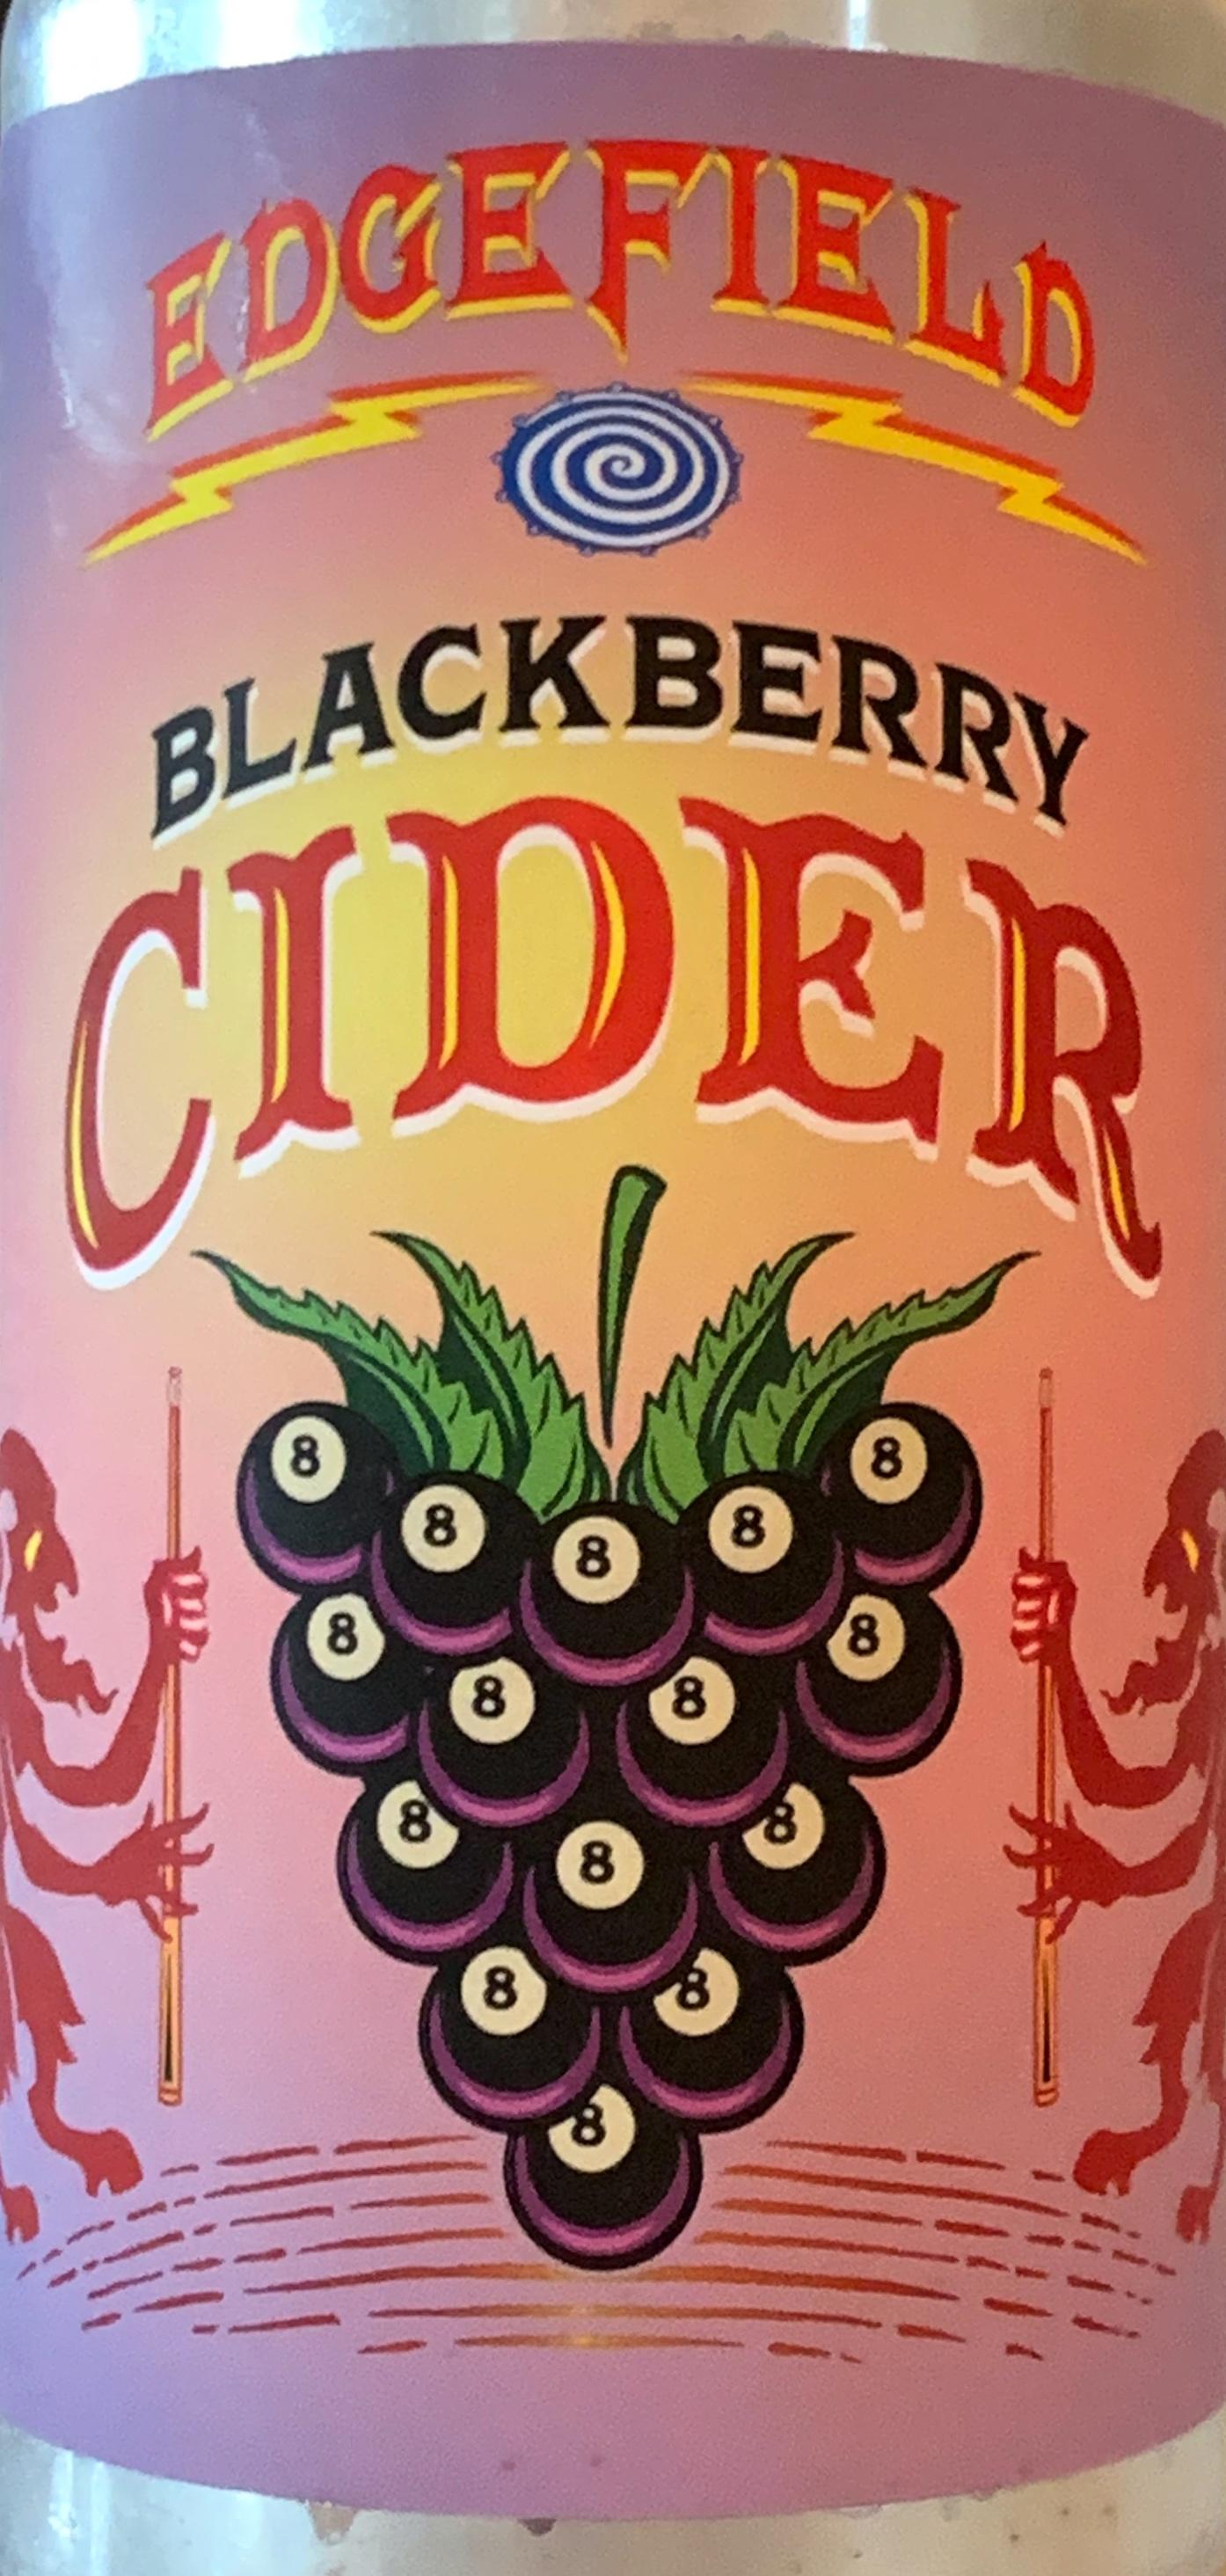 Blackberry Cider